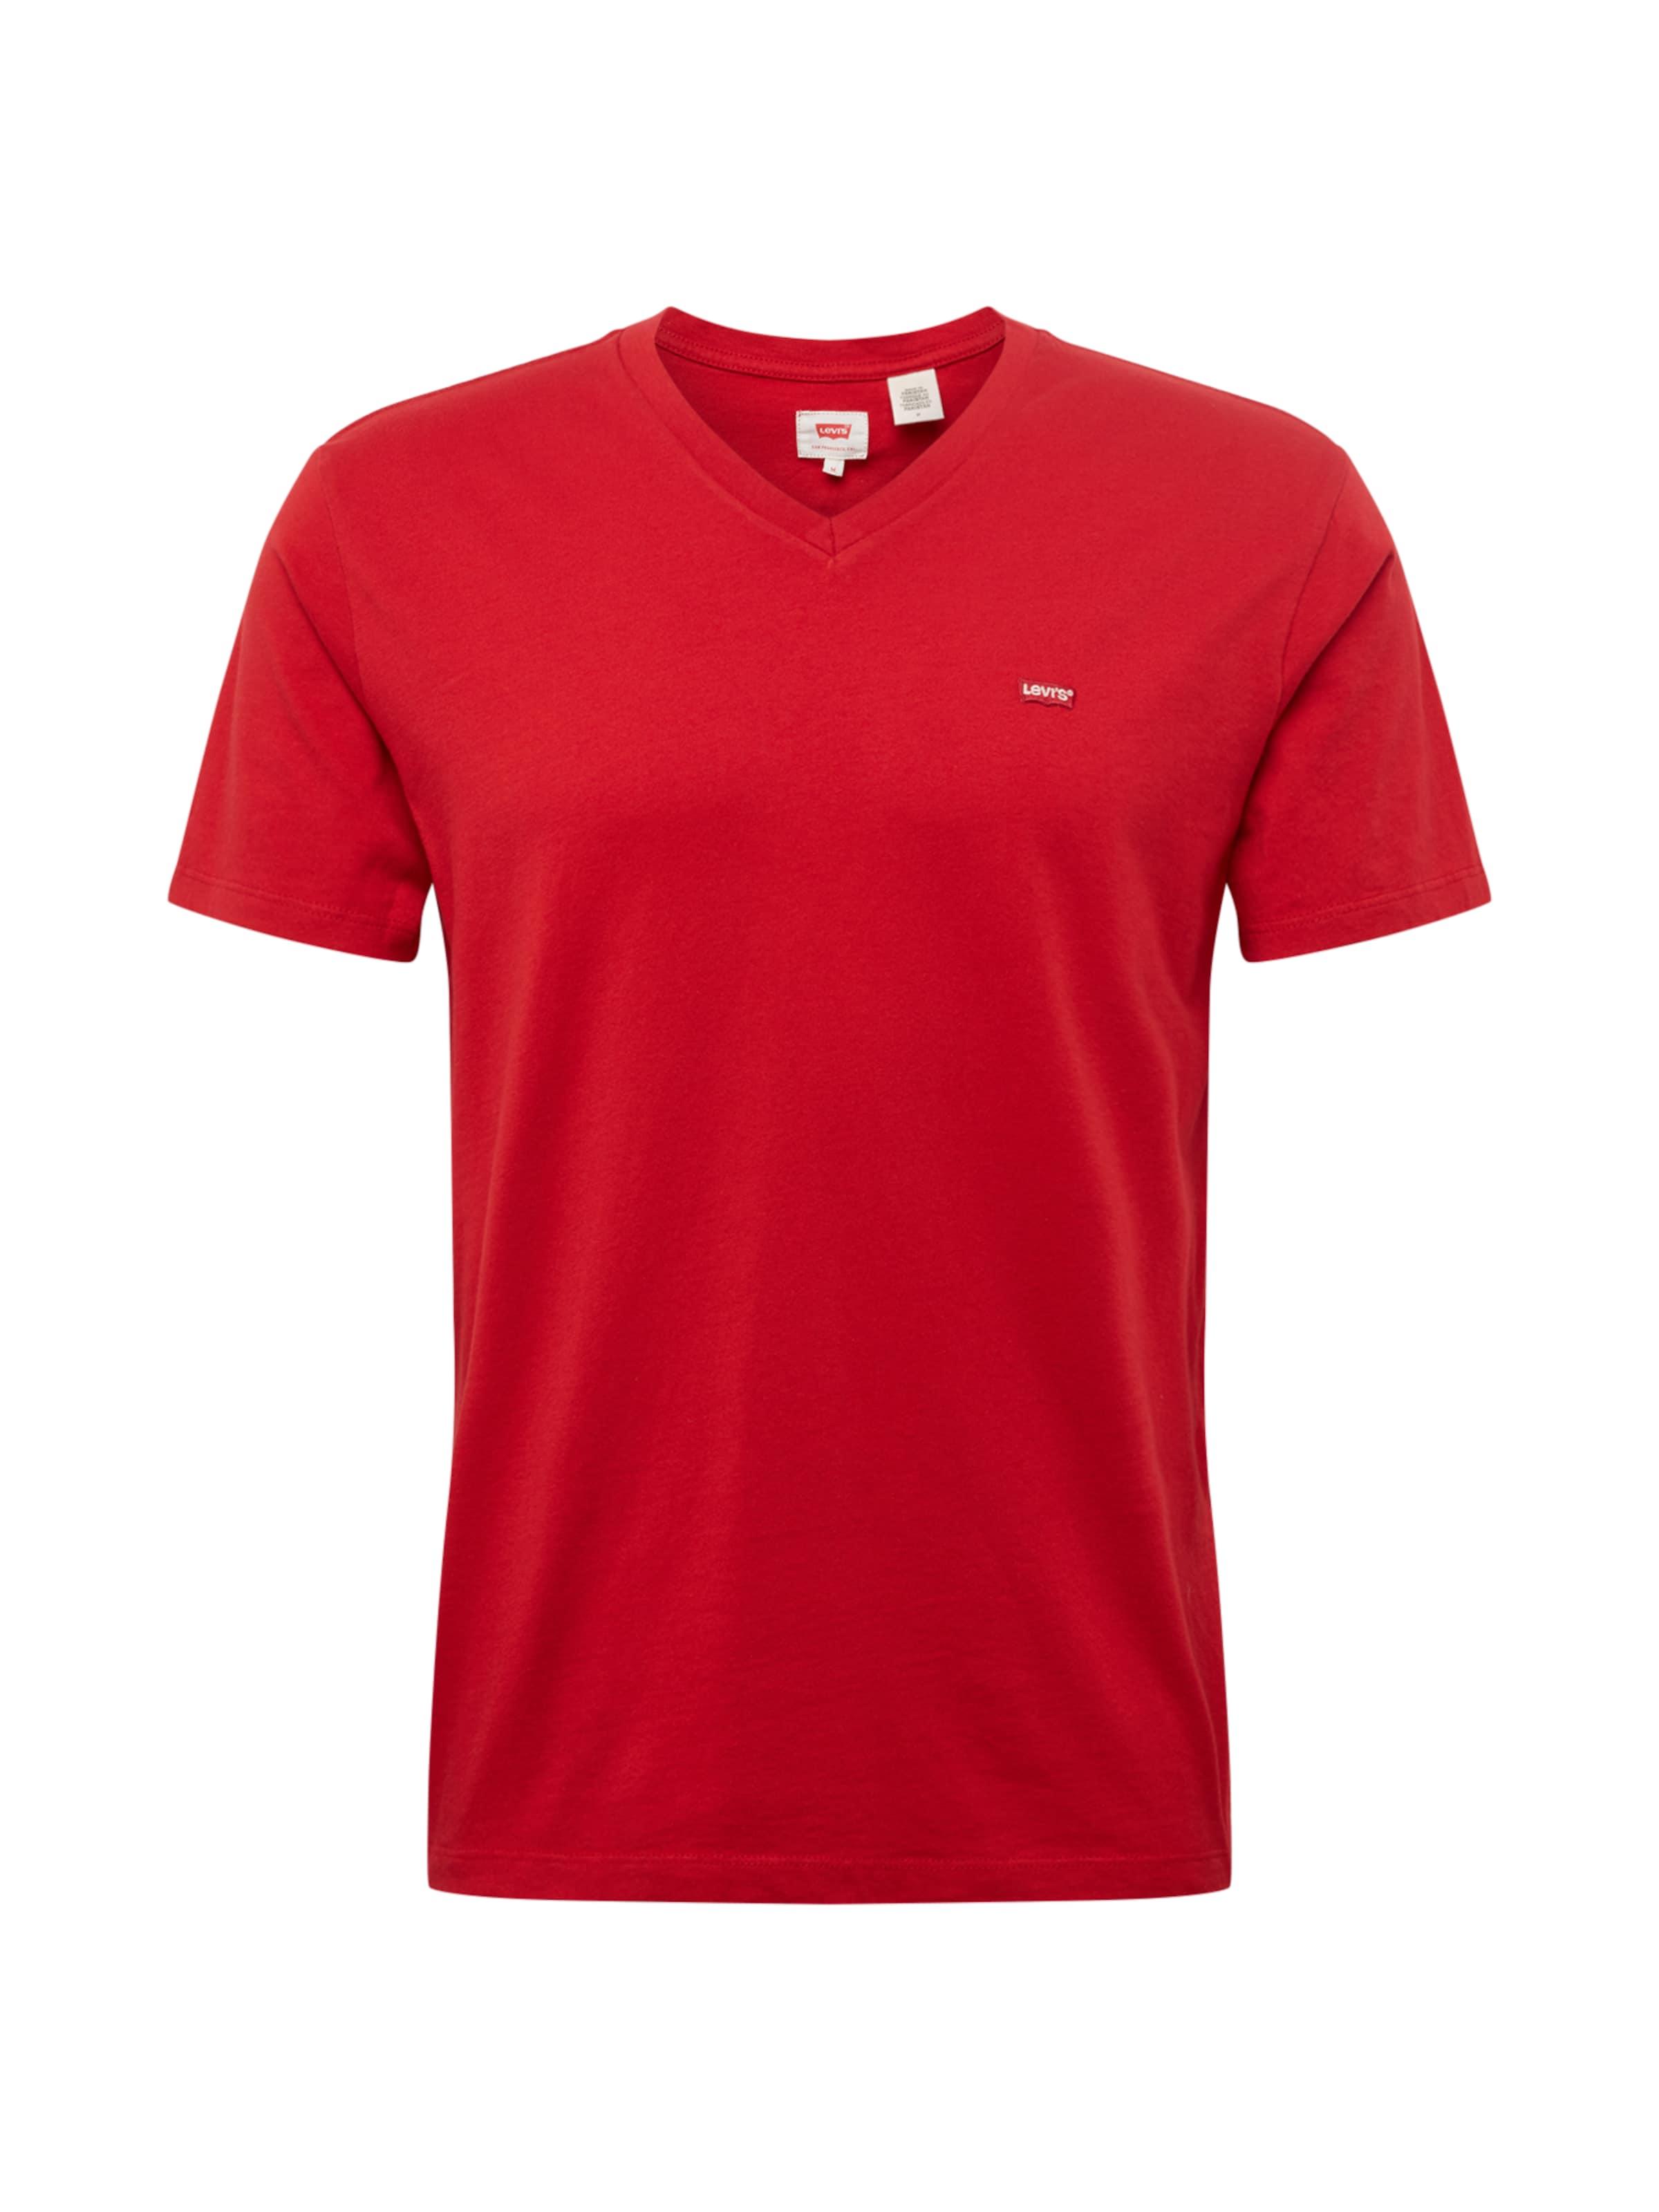 shirt T Levi's Rot In 'orighmvneck' 3A4q5RjL